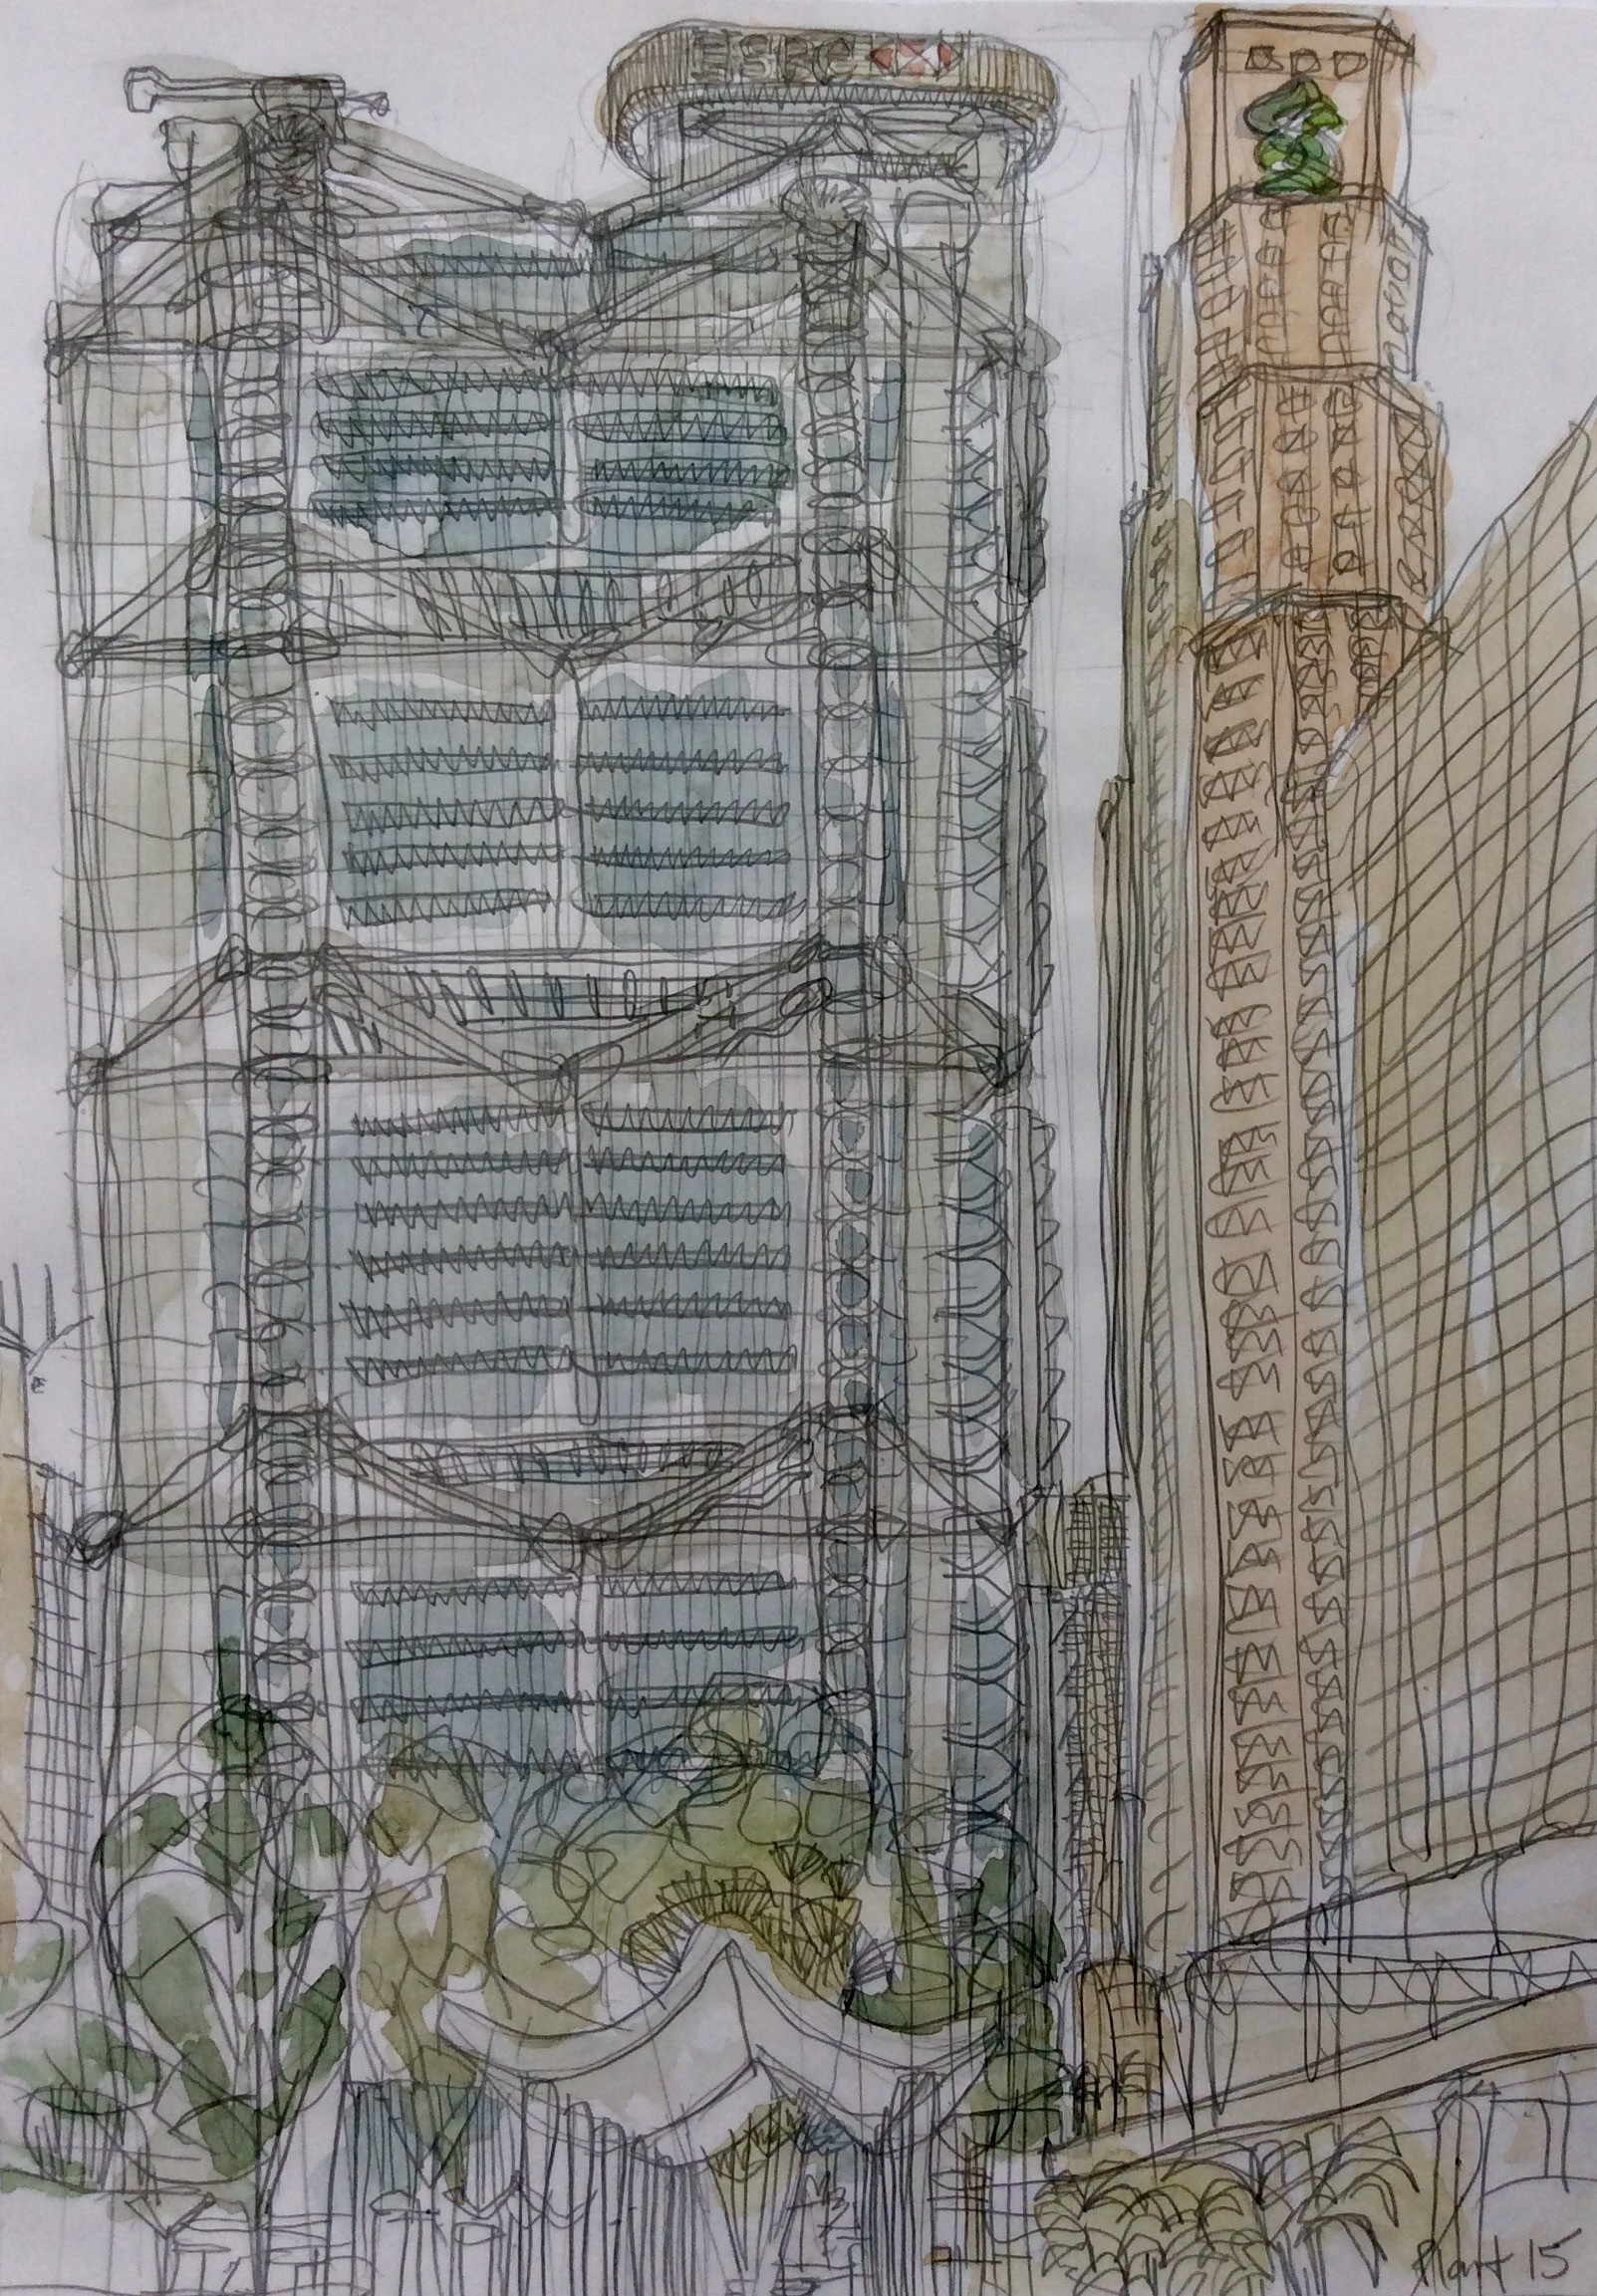 HSBC Building - Hong Kong